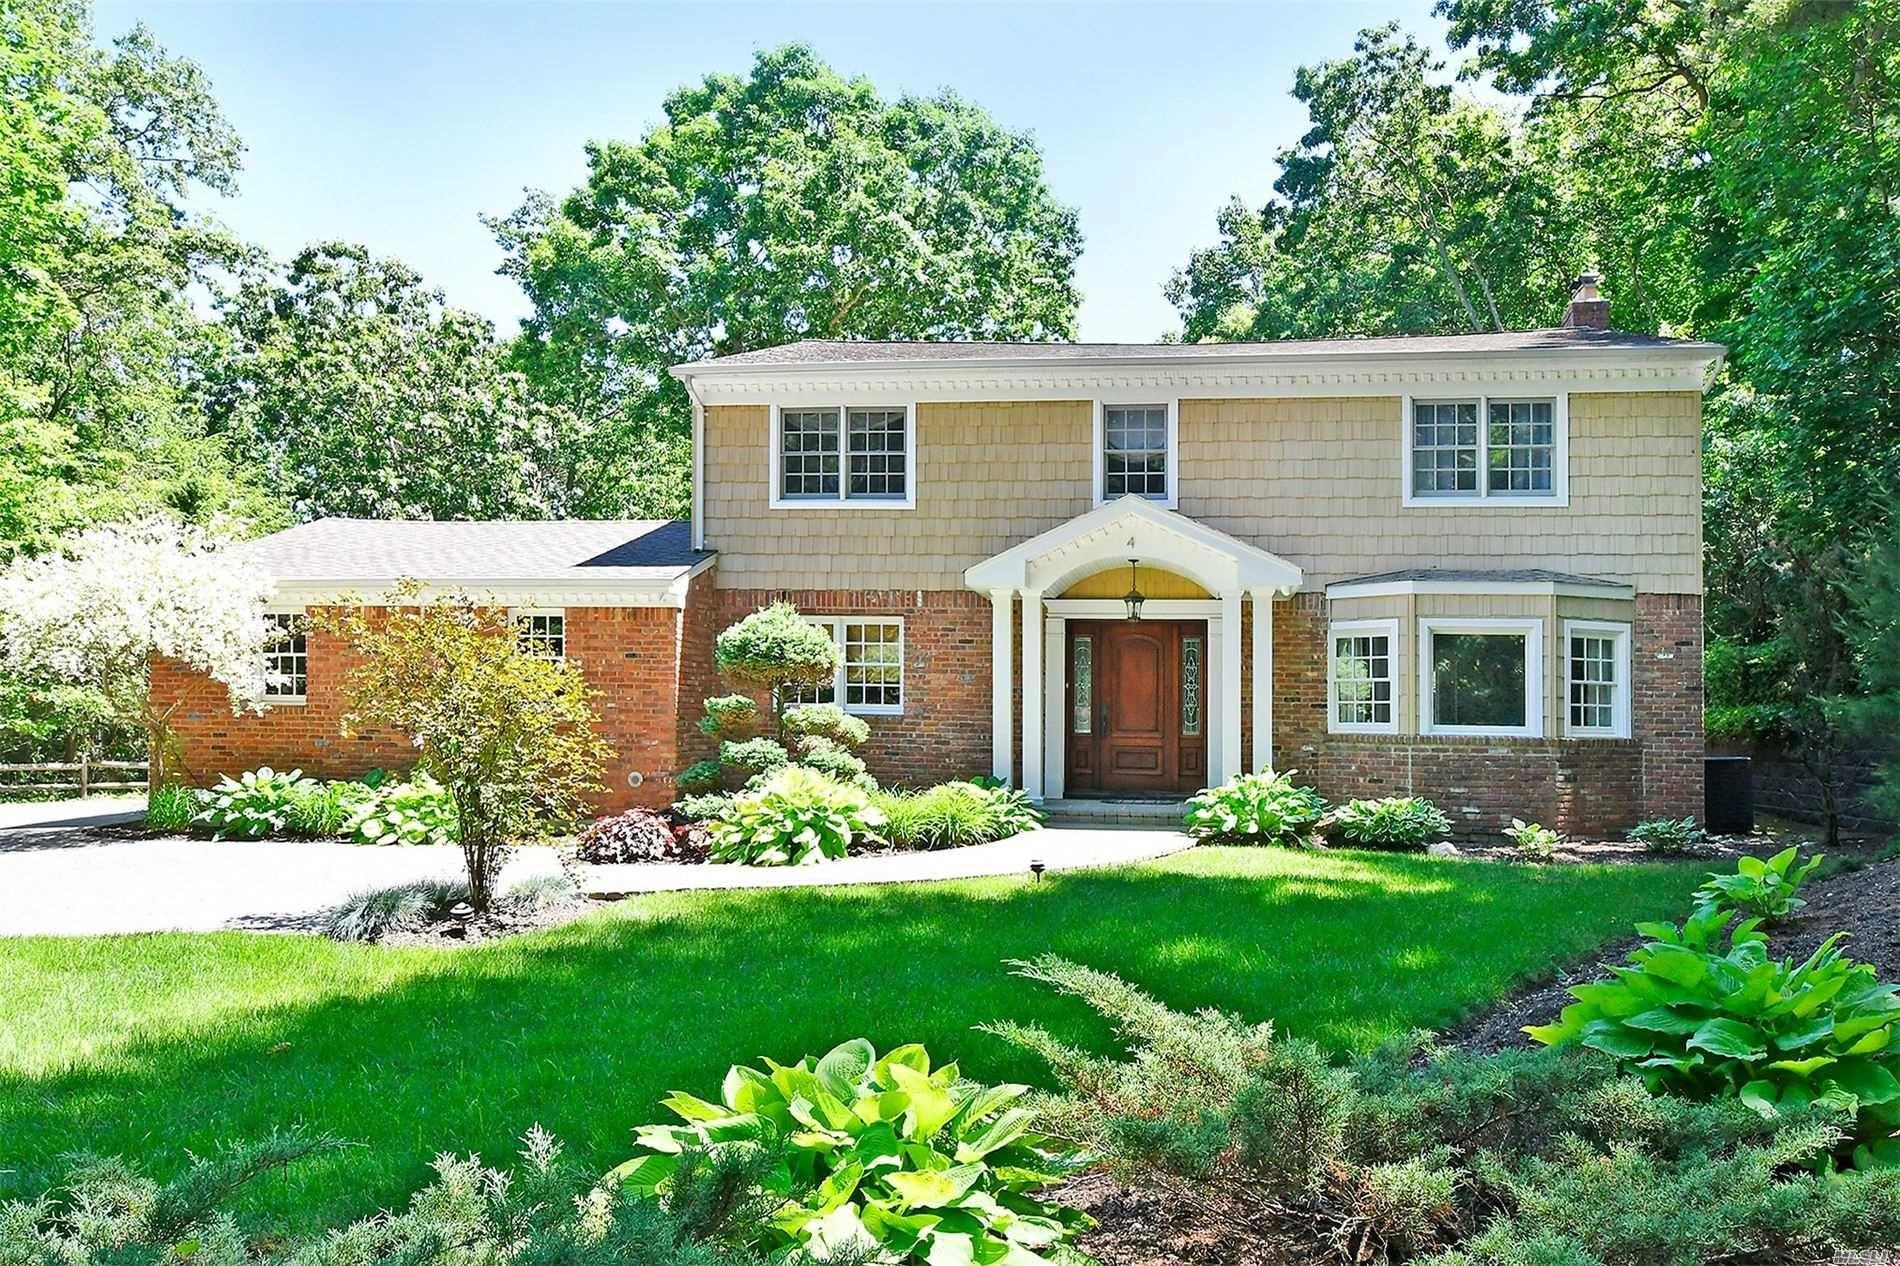 4 Greenbriar Lane, Dix Hills, NY 11746 - MLS#: 3205441